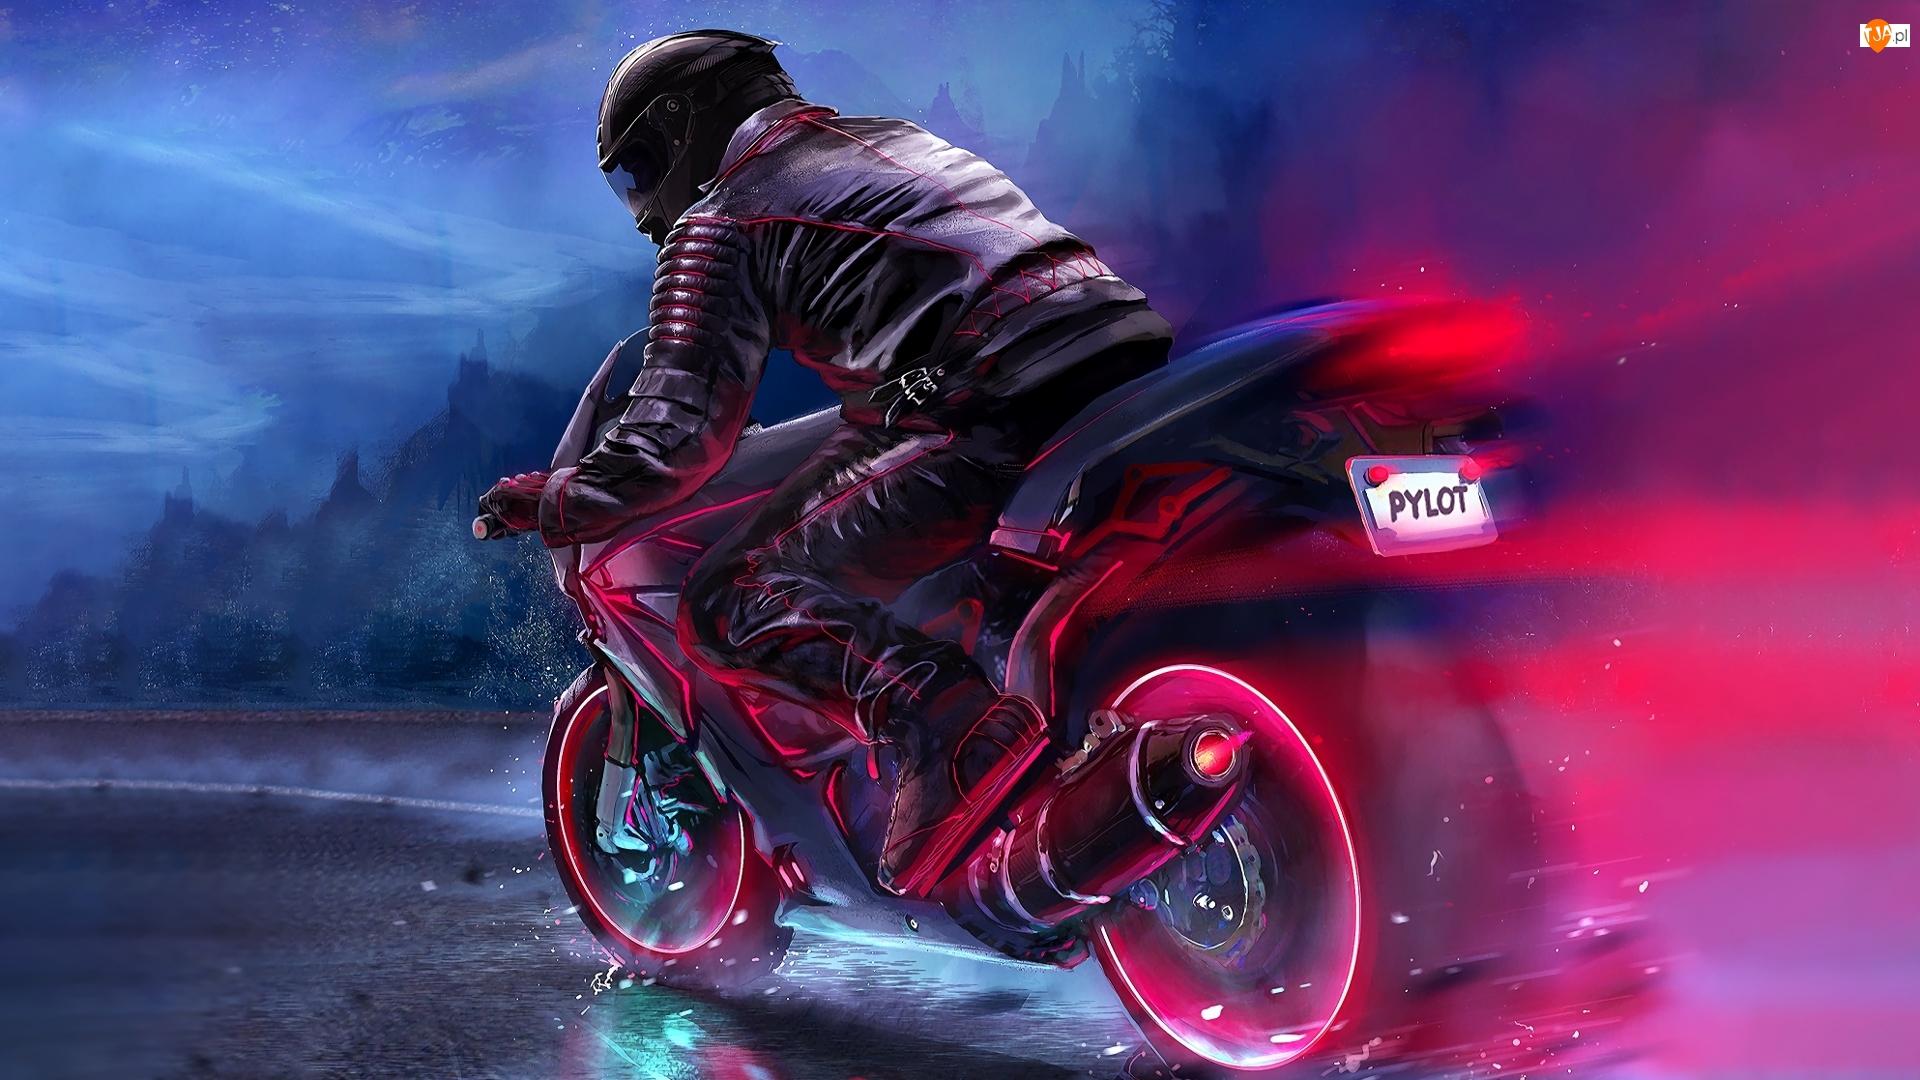 Motocyklista, Pilot, Motocykl, Digital Art, Kask